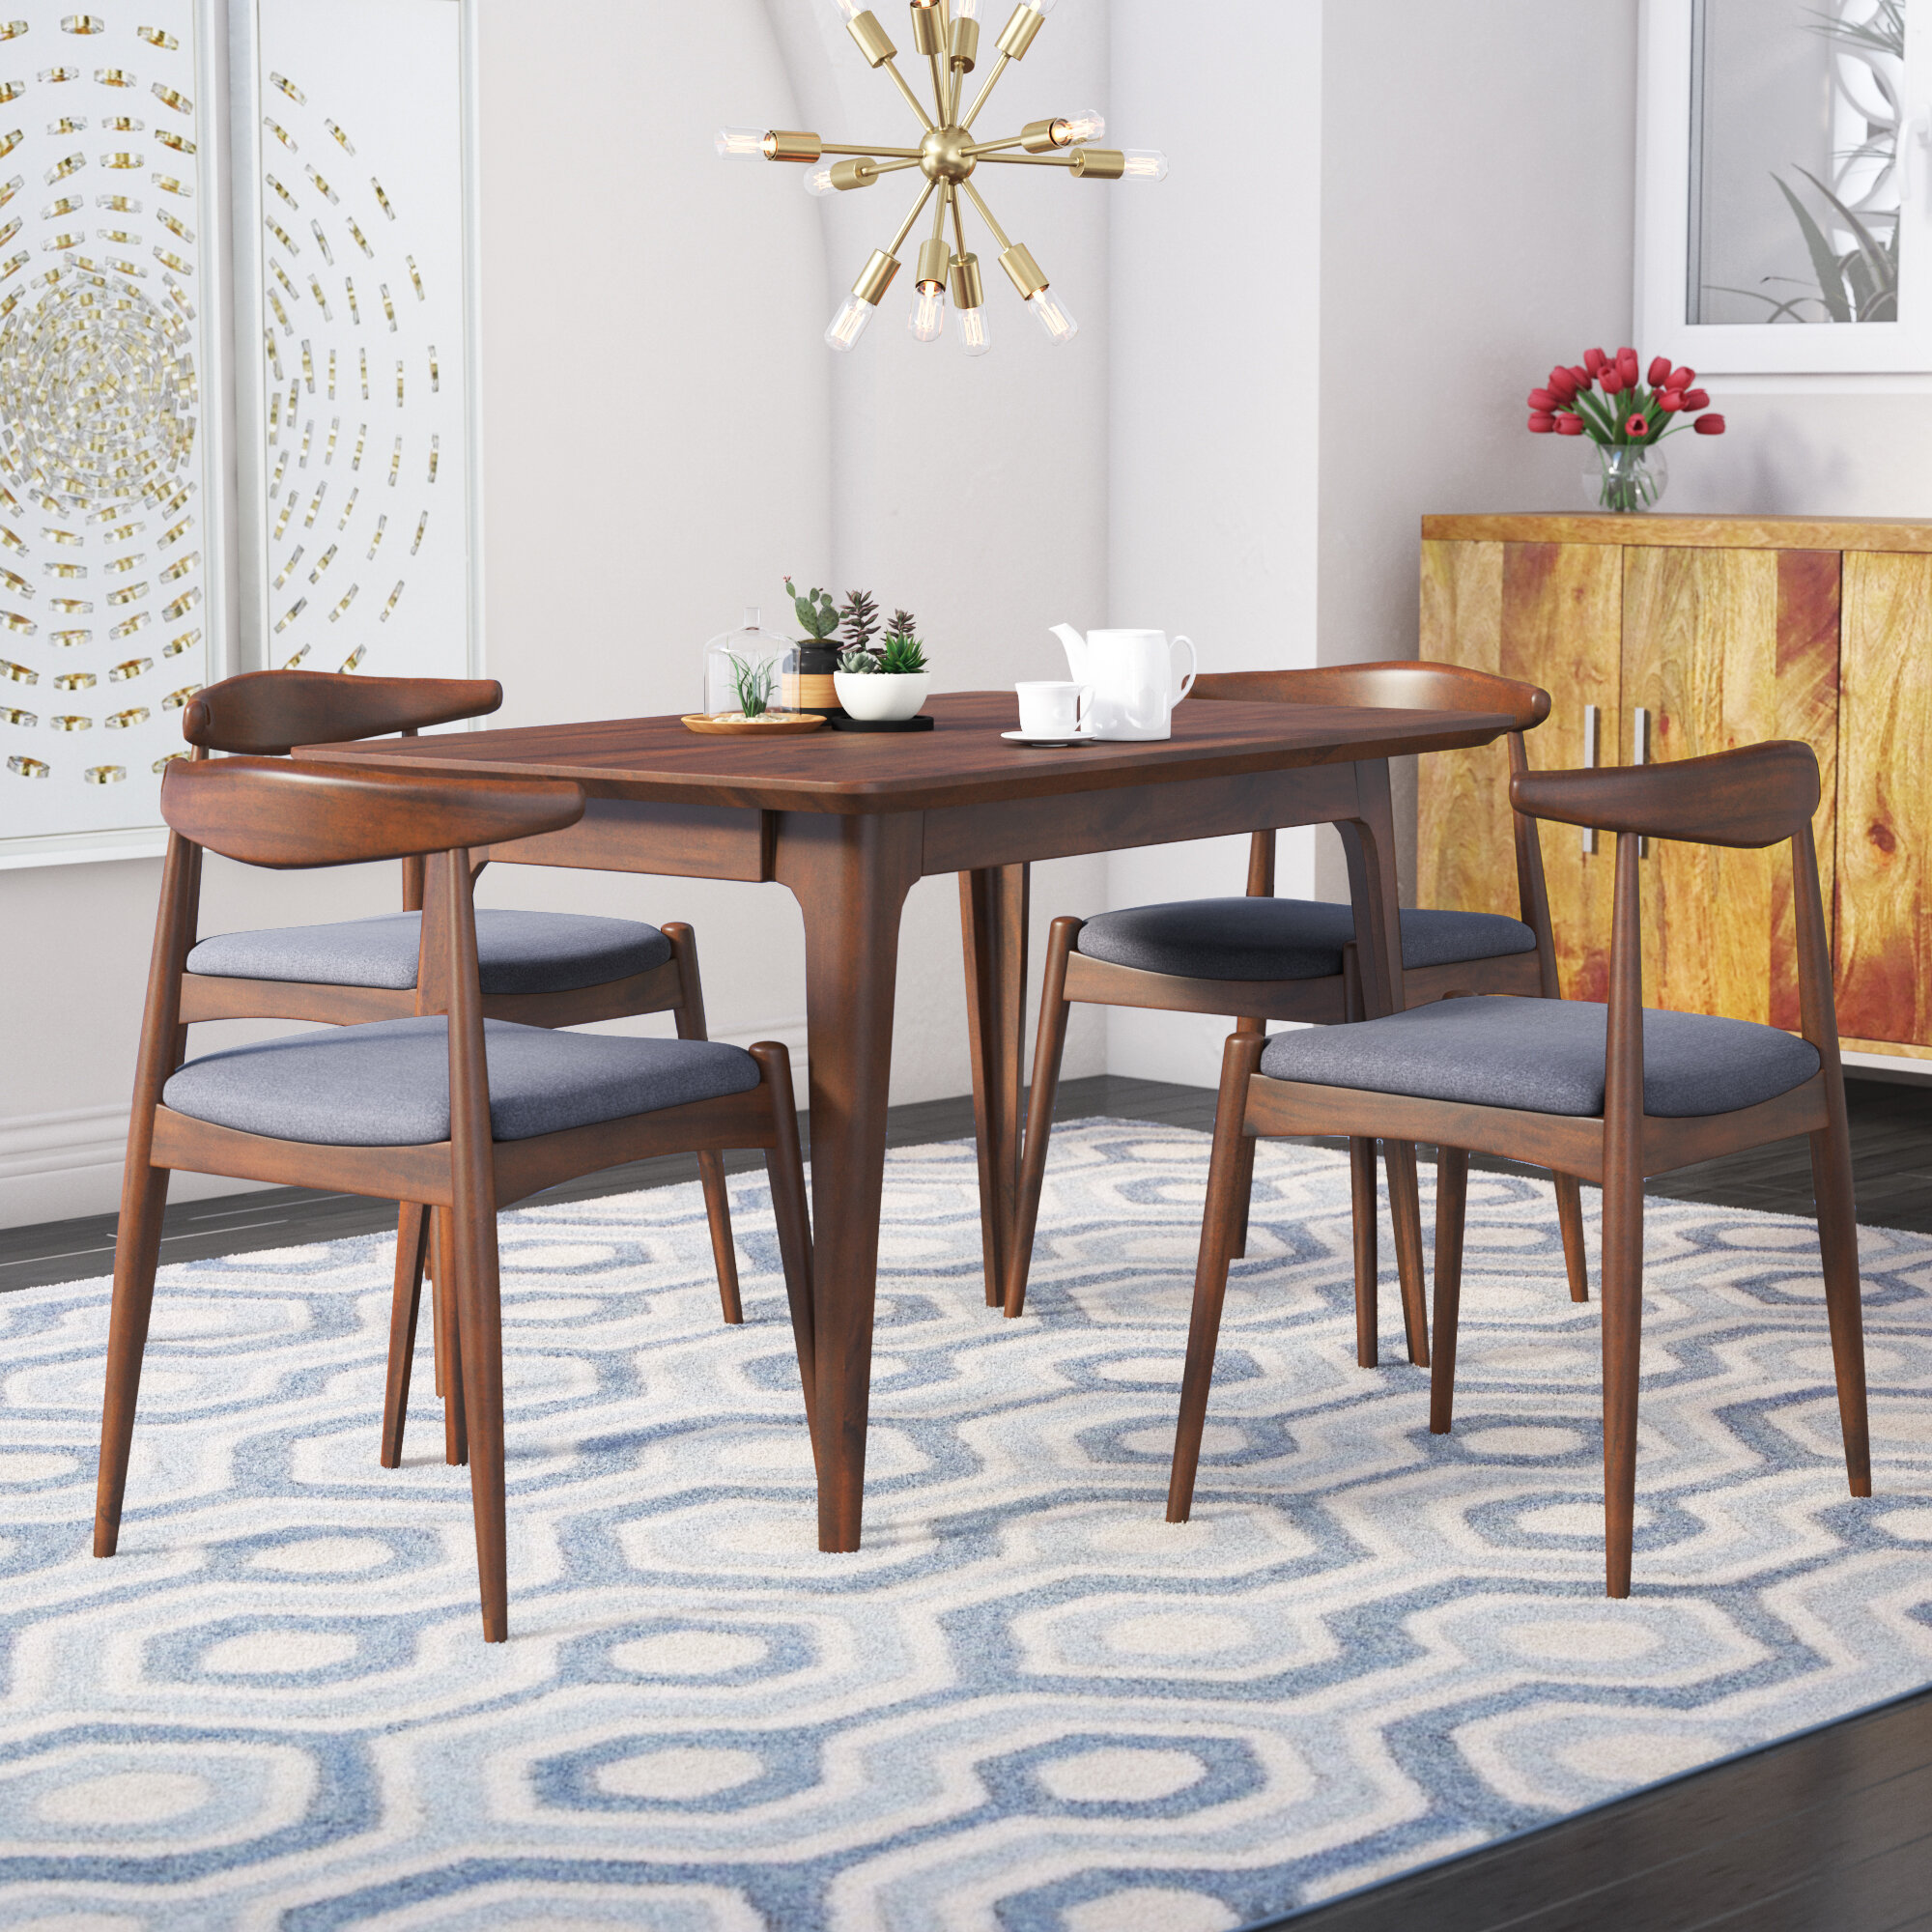 Tremendous Millie 5 Piece Mid Century Dining Set Camellatalisay Diy Chair Ideas Camellatalisaycom